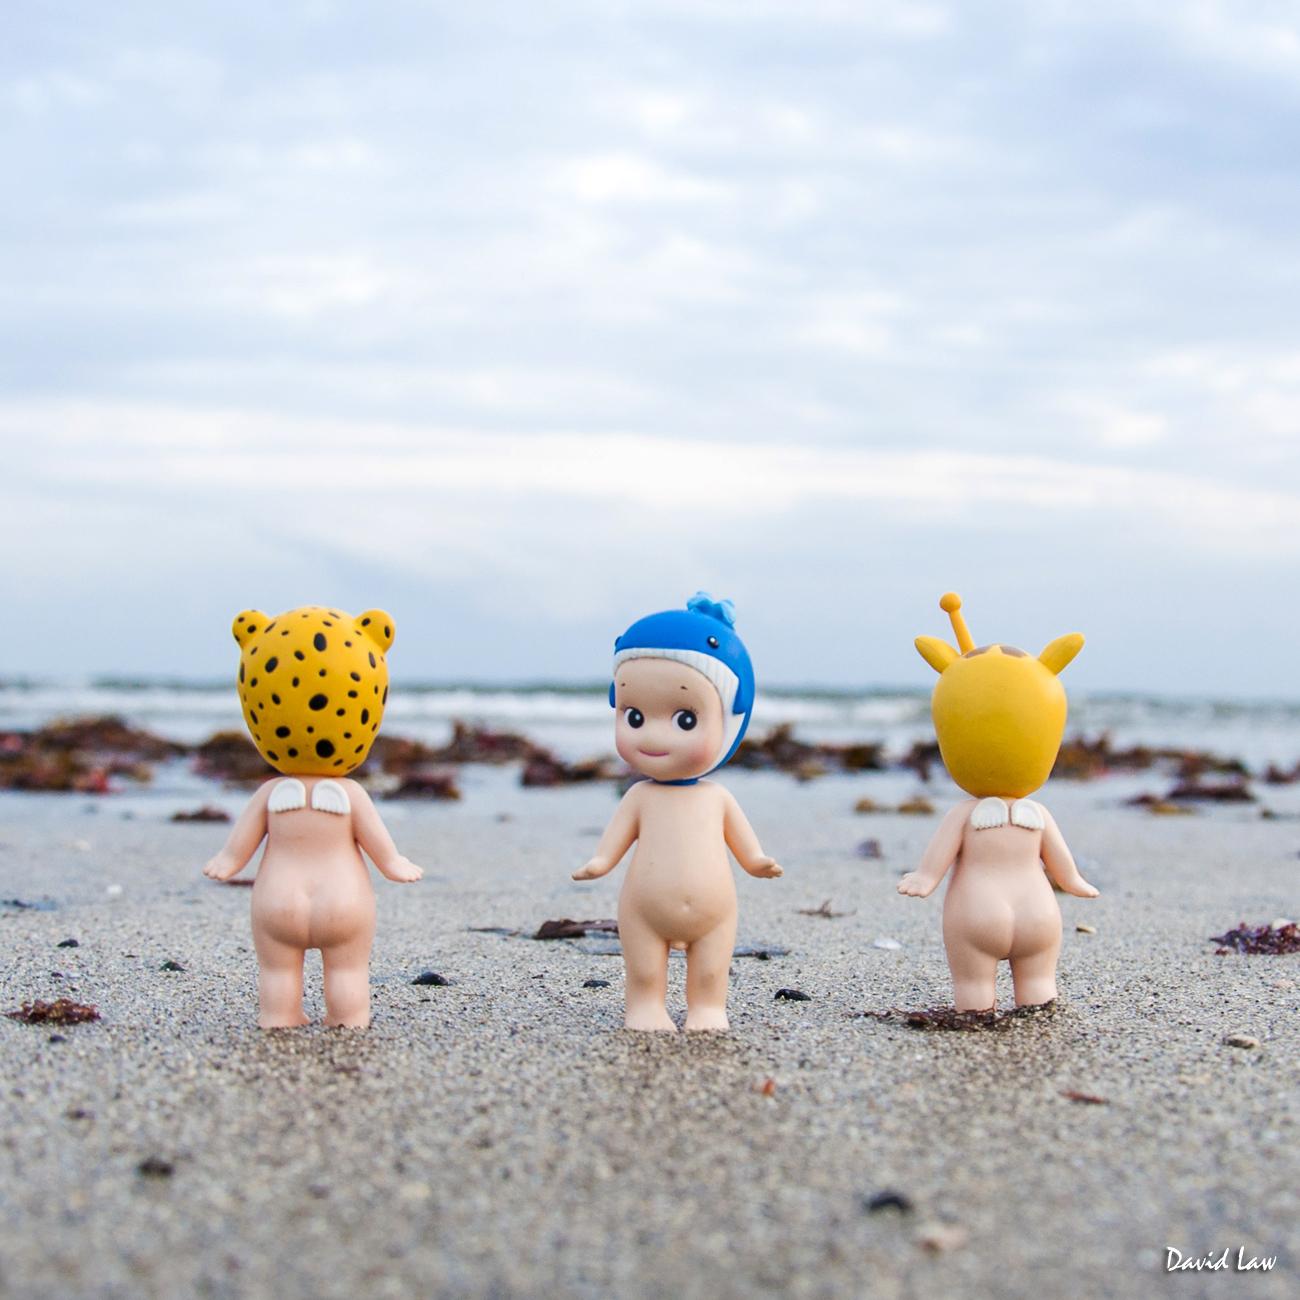 Kamakura Beach Square copie